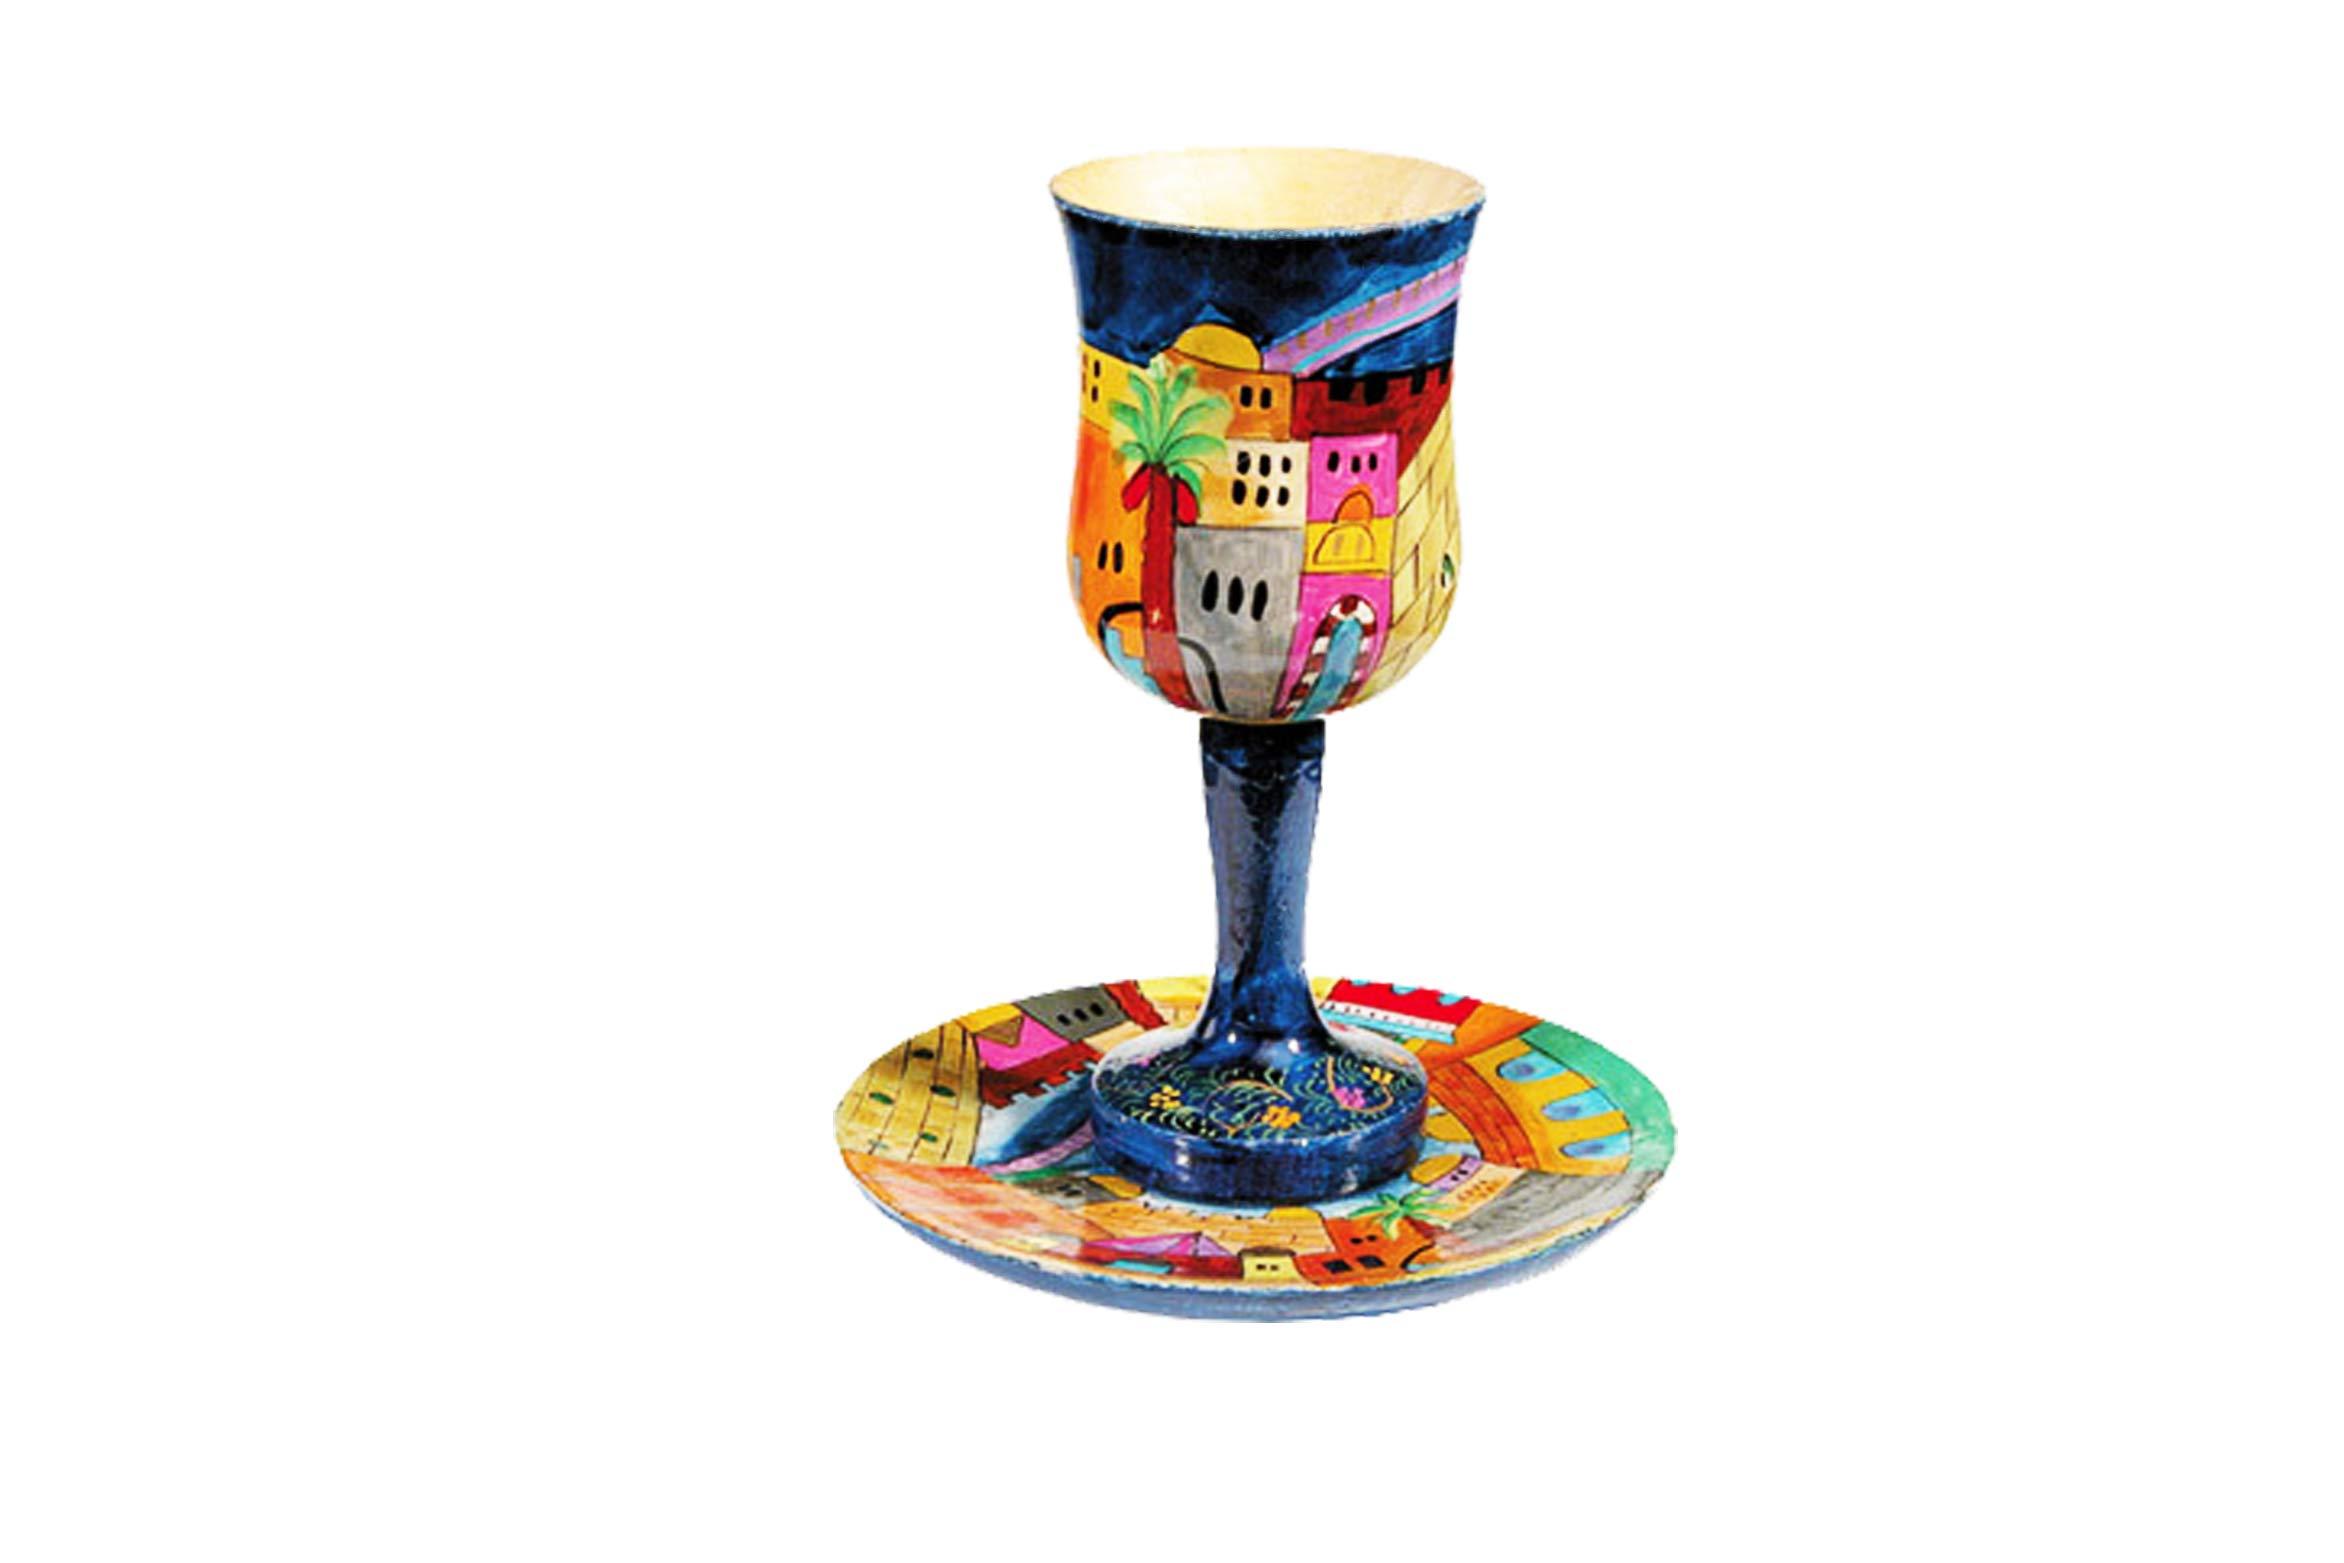 Yair Emanuel Silk Jerusalem Challah Cover & Kiddush Cup Set for Shabbat Jewish Wedding or Bar Mitzvah & Bat Mitzvah Gift. by Yair Emanuel (Image #3)